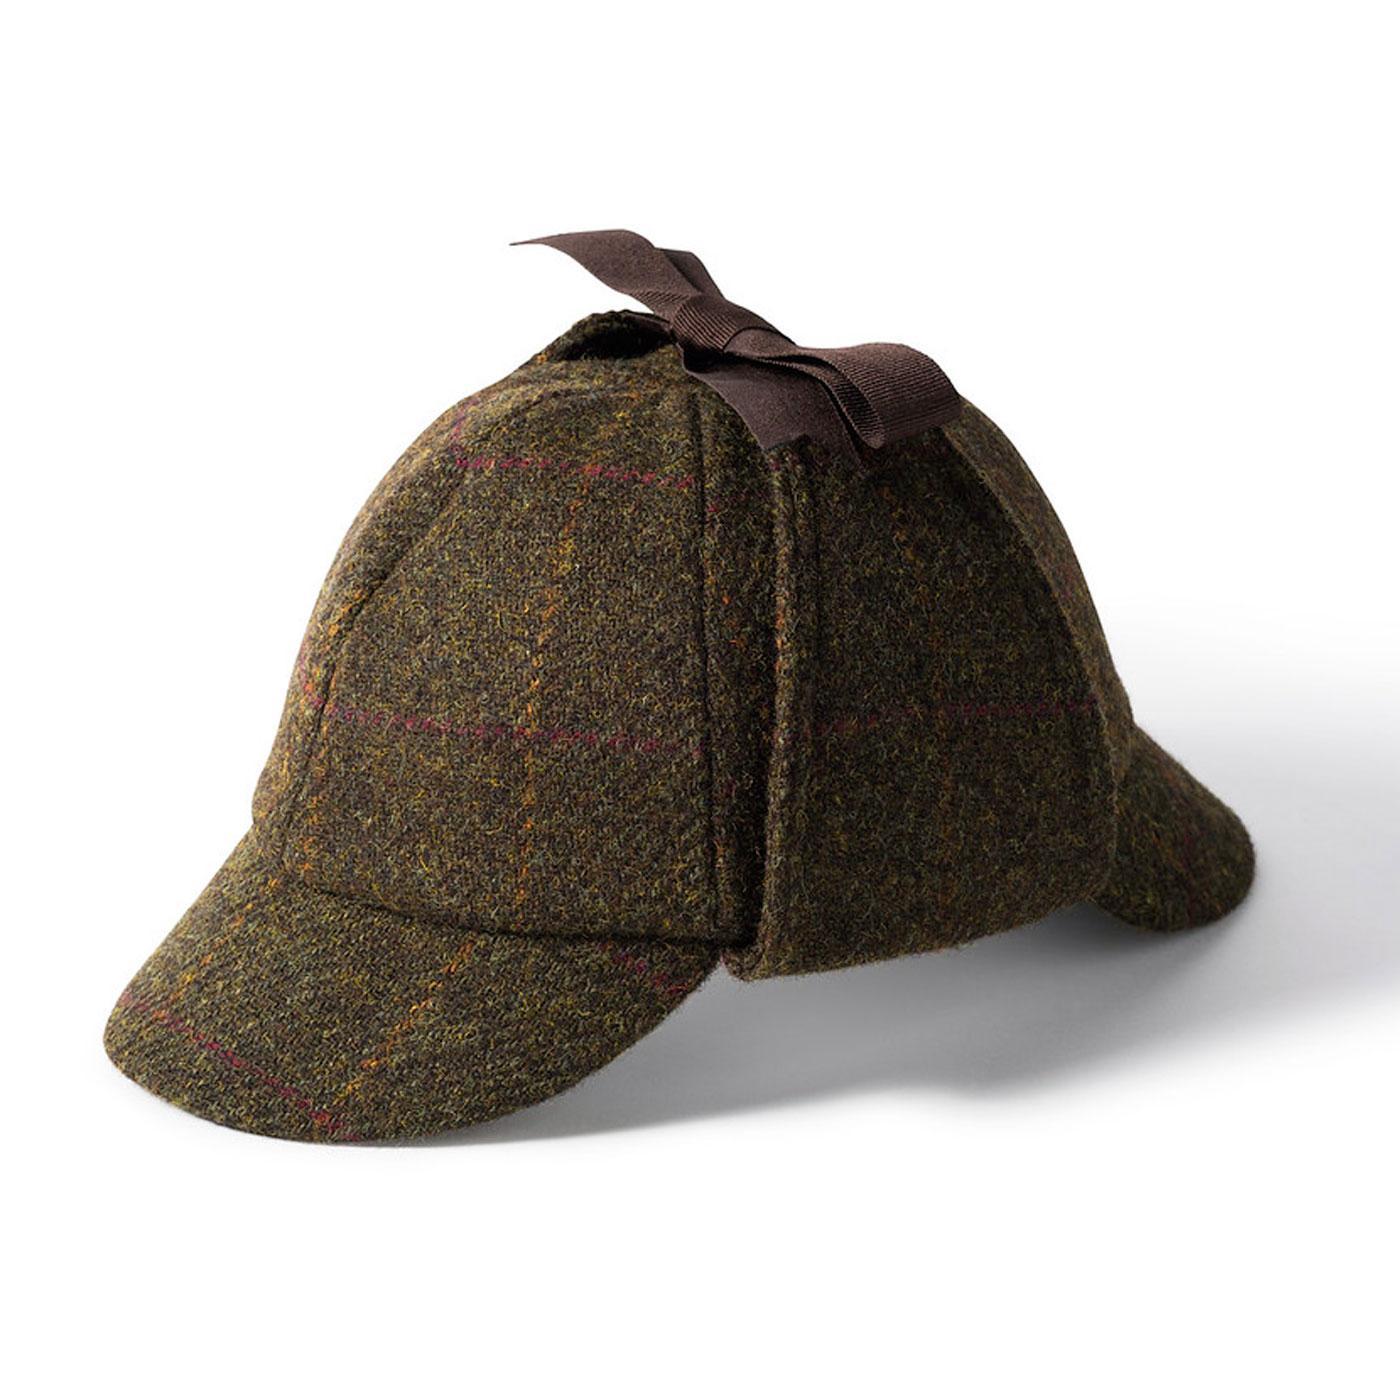 Sherlock FAILSWORTH Harris Tweed Deerstalker Hat